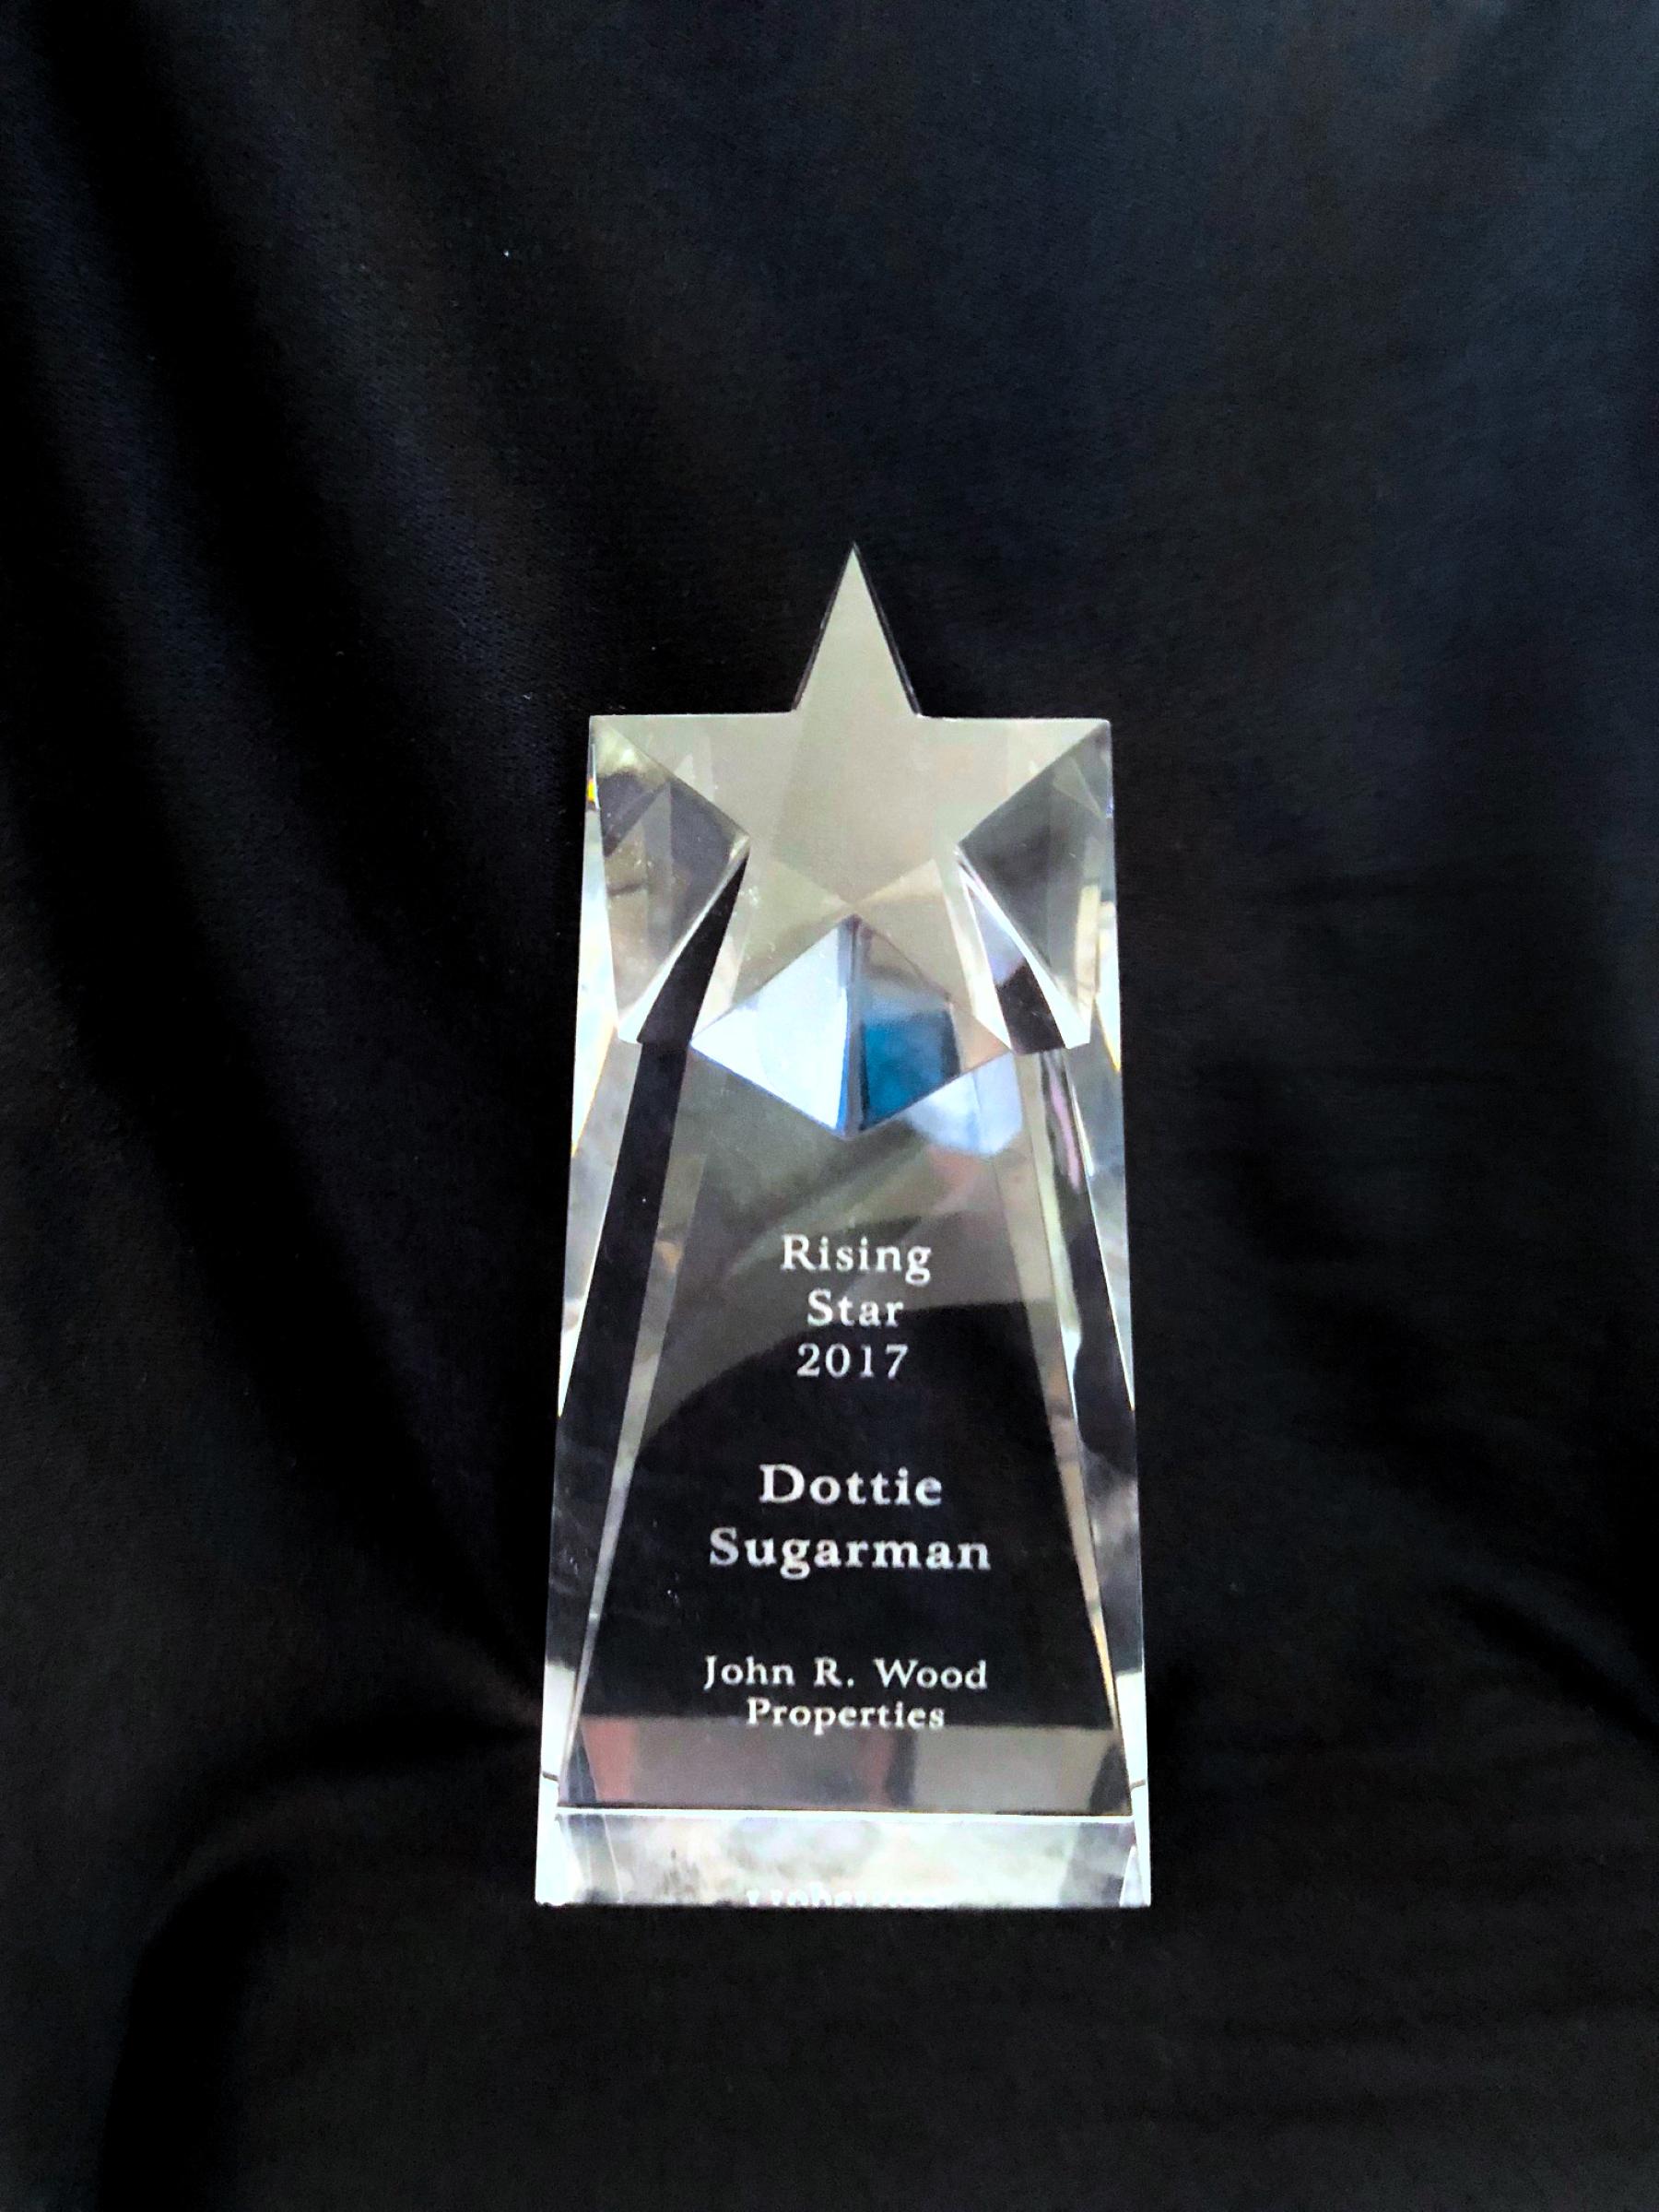 Rising Star Award presented by John R Wood Properties